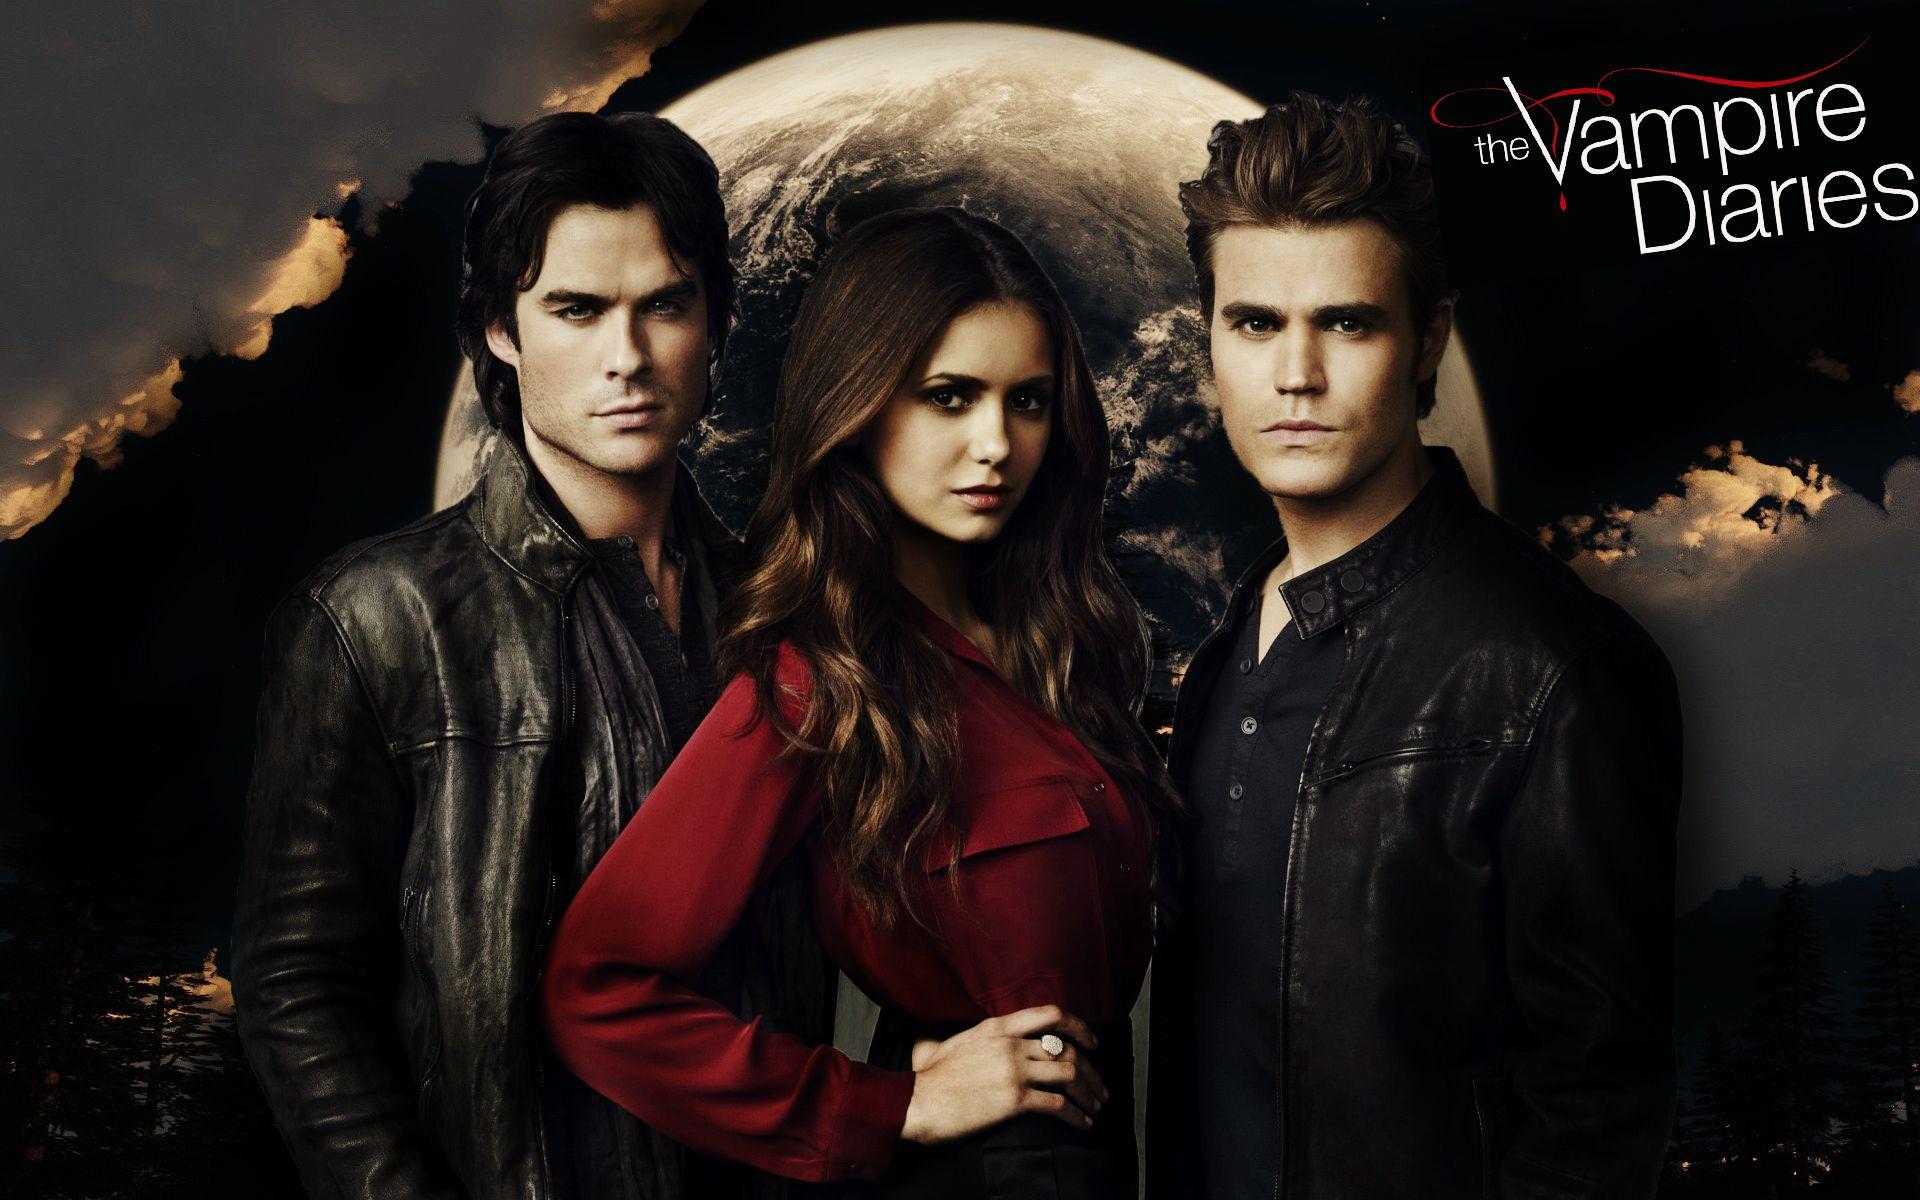 The Vampire Diaries - Vampire Diaries , HD Wallpaper & Backgrounds